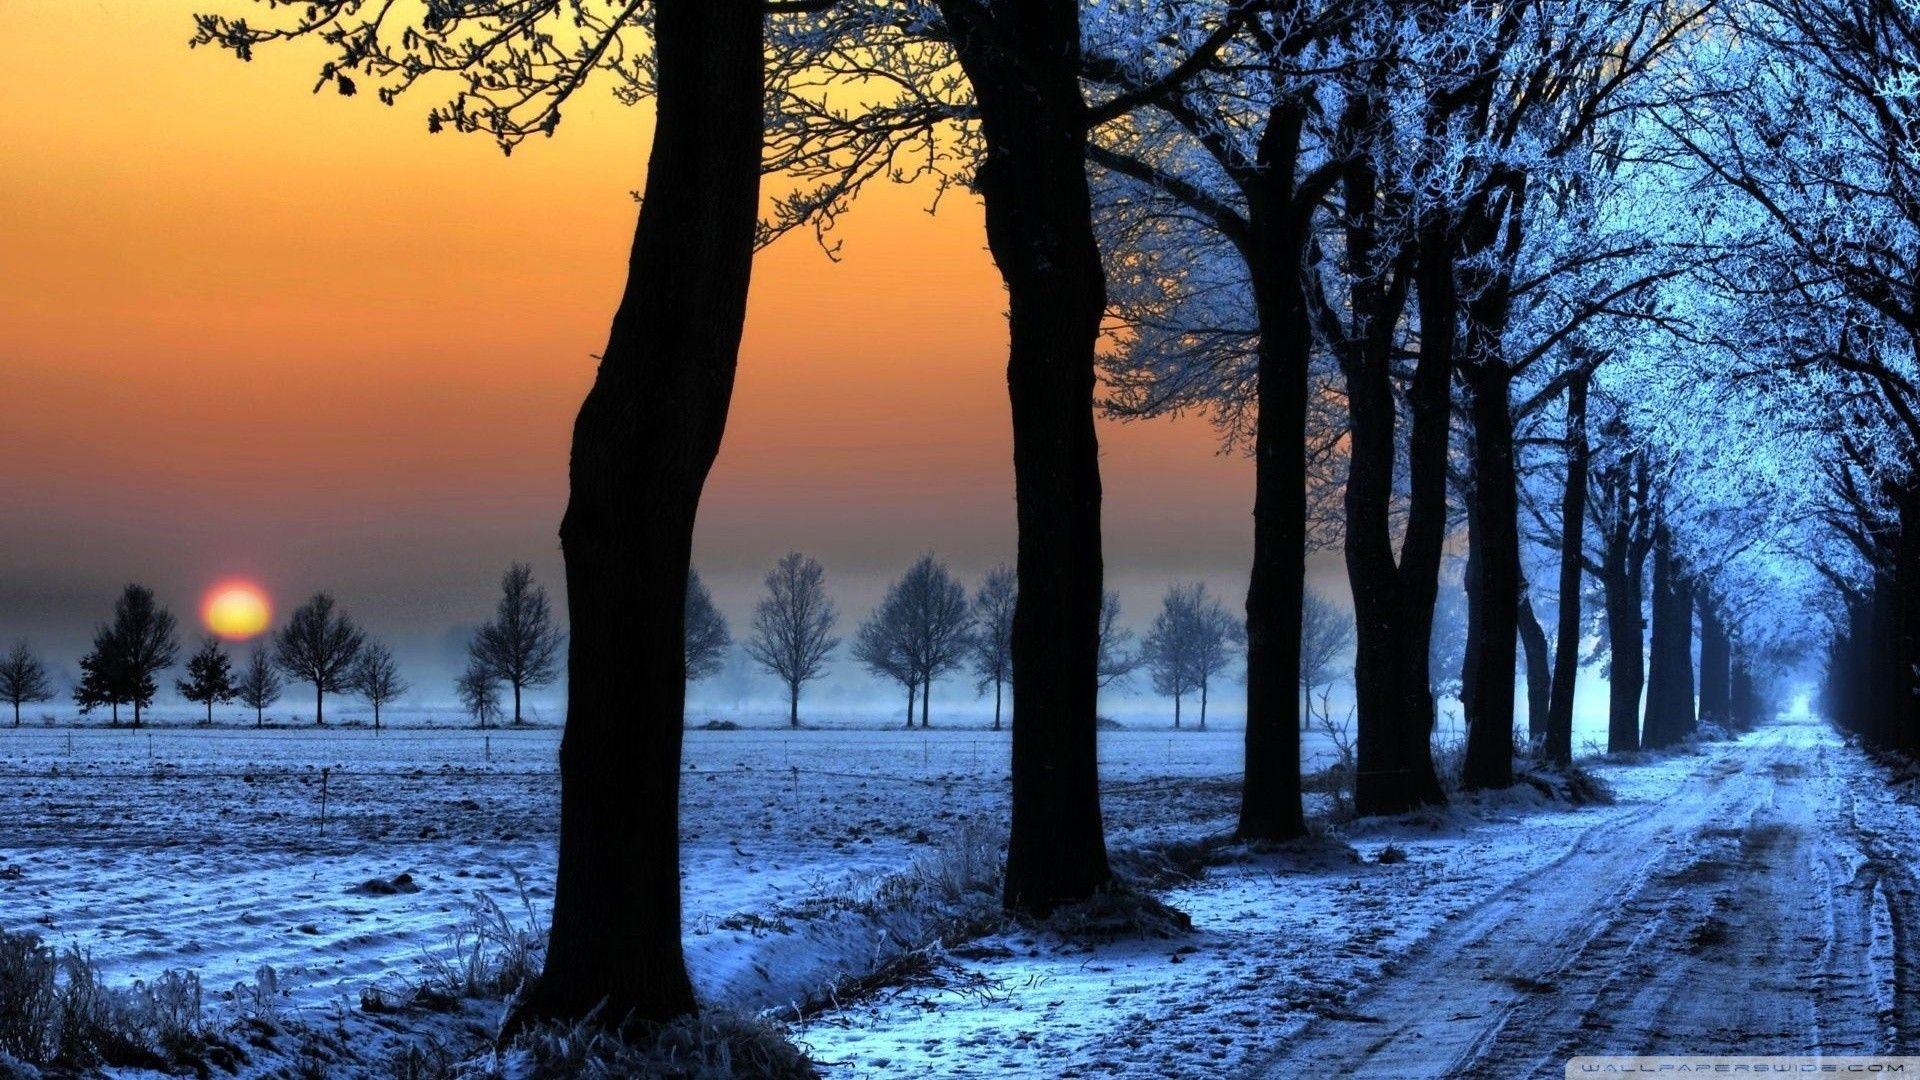 Winter Nature Wallpaper Free For Desktop Wallpaper Winter Landscape Winter Sunset Winter Nature